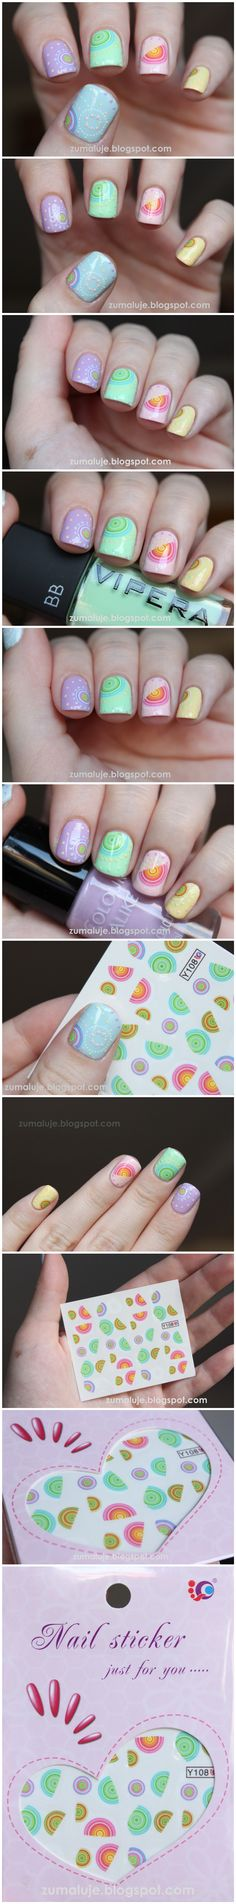 $0.99 Nail Water Decals Sticker Transfer Sticker Colorful Half Round Ring Form Y108 - BornPrettyStore.com